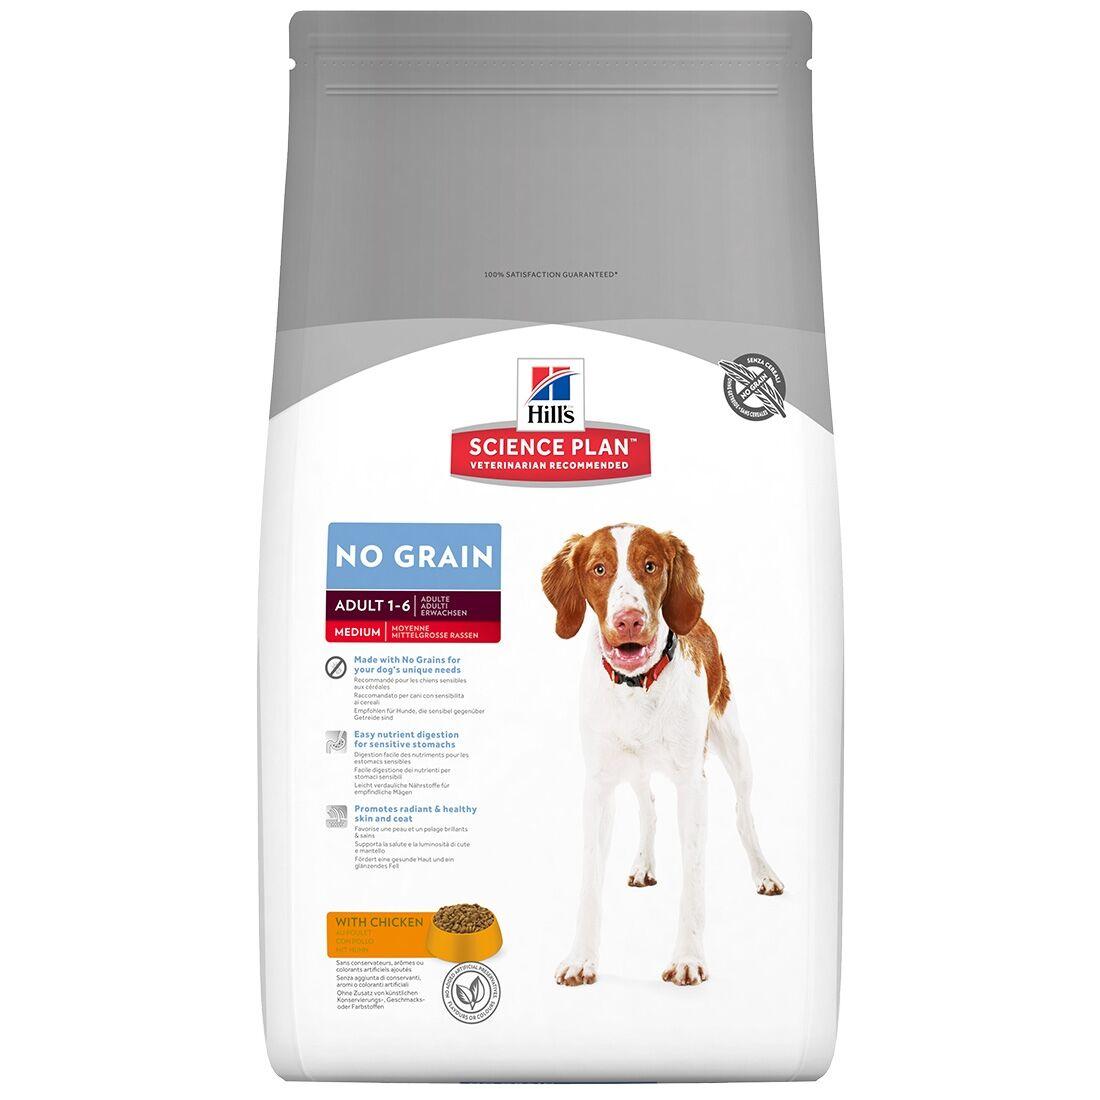 Hill's Science Plan Adult Medium No Grain Chicken Contenance : 14 kg